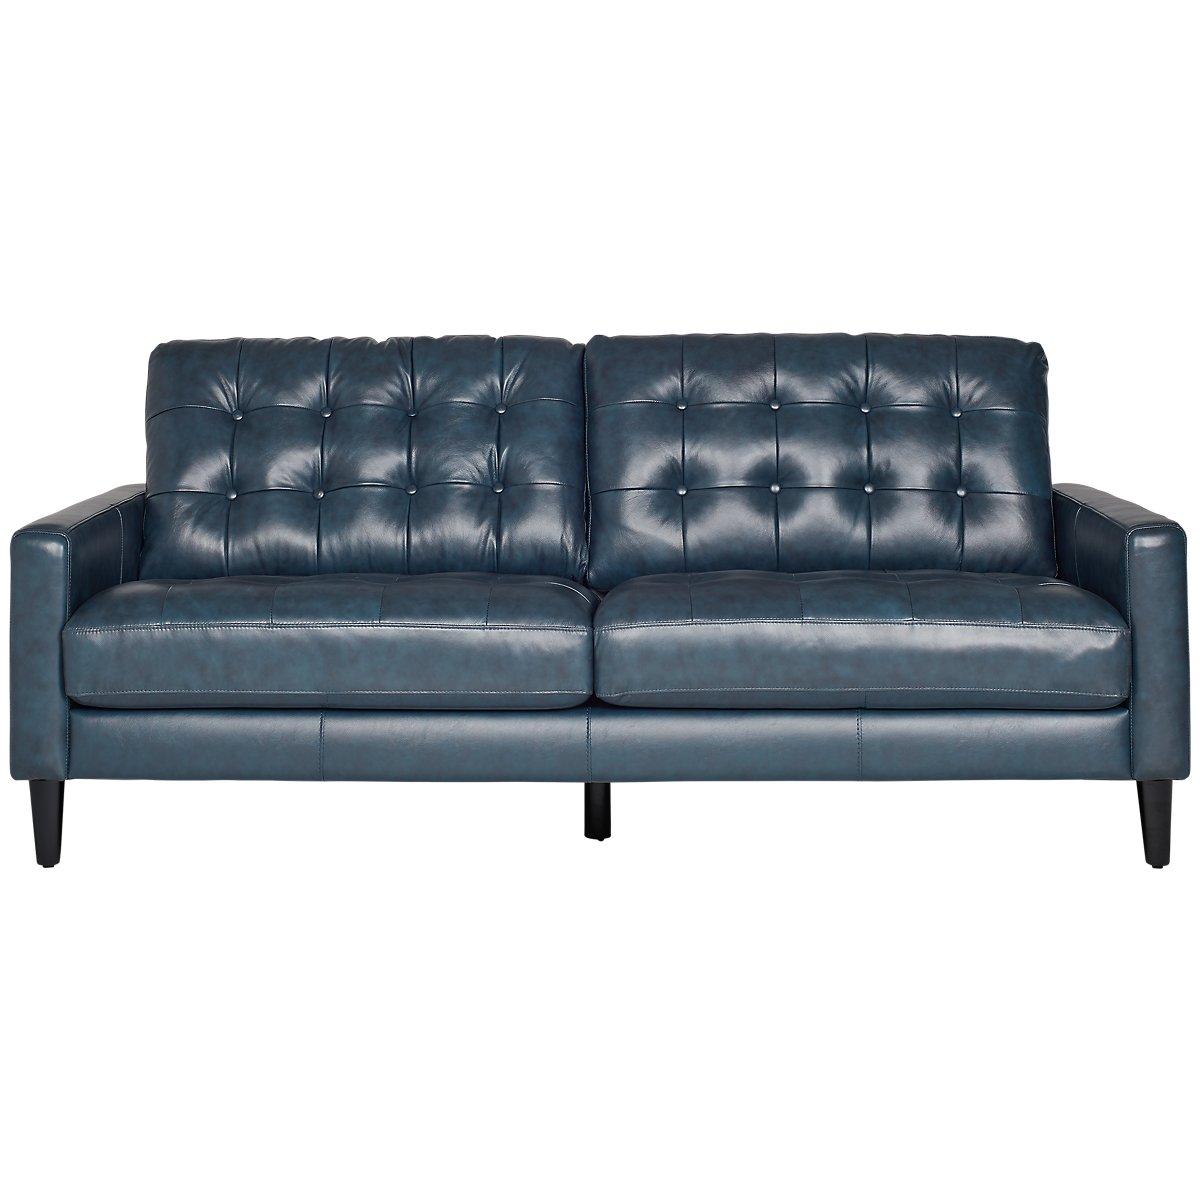 Finley Dark Blue Leather & Vinyl Sofa | Living Room - Sofas | City Furniture